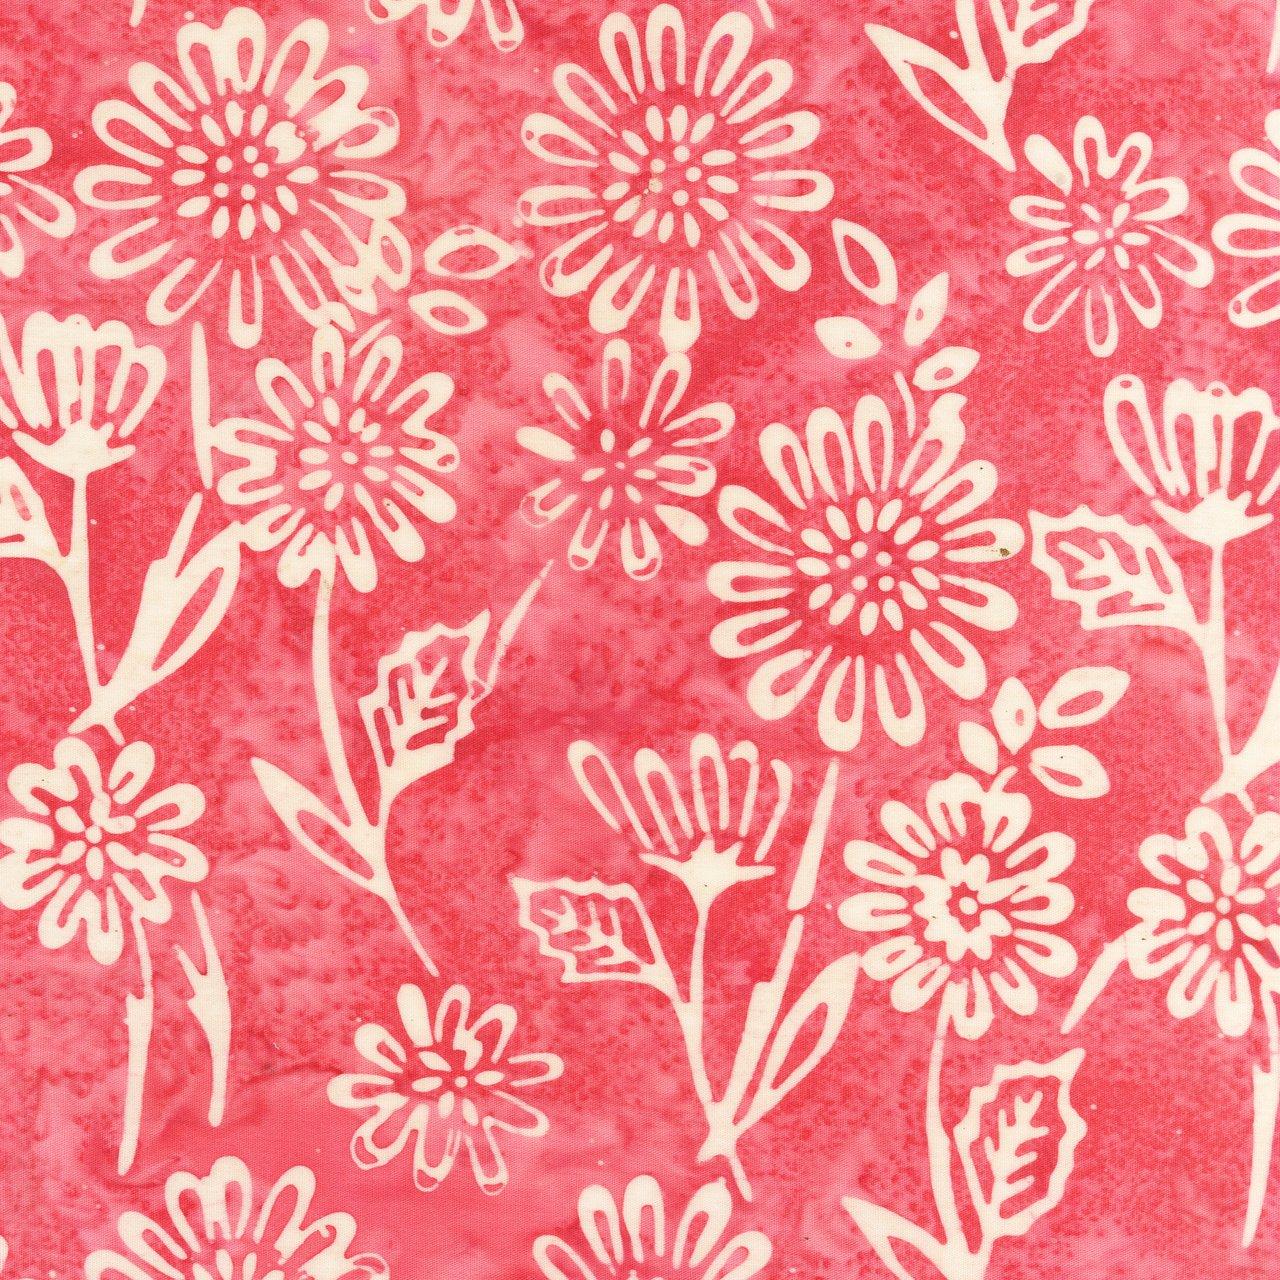 Fabric Anthology Pink 2032Q-X